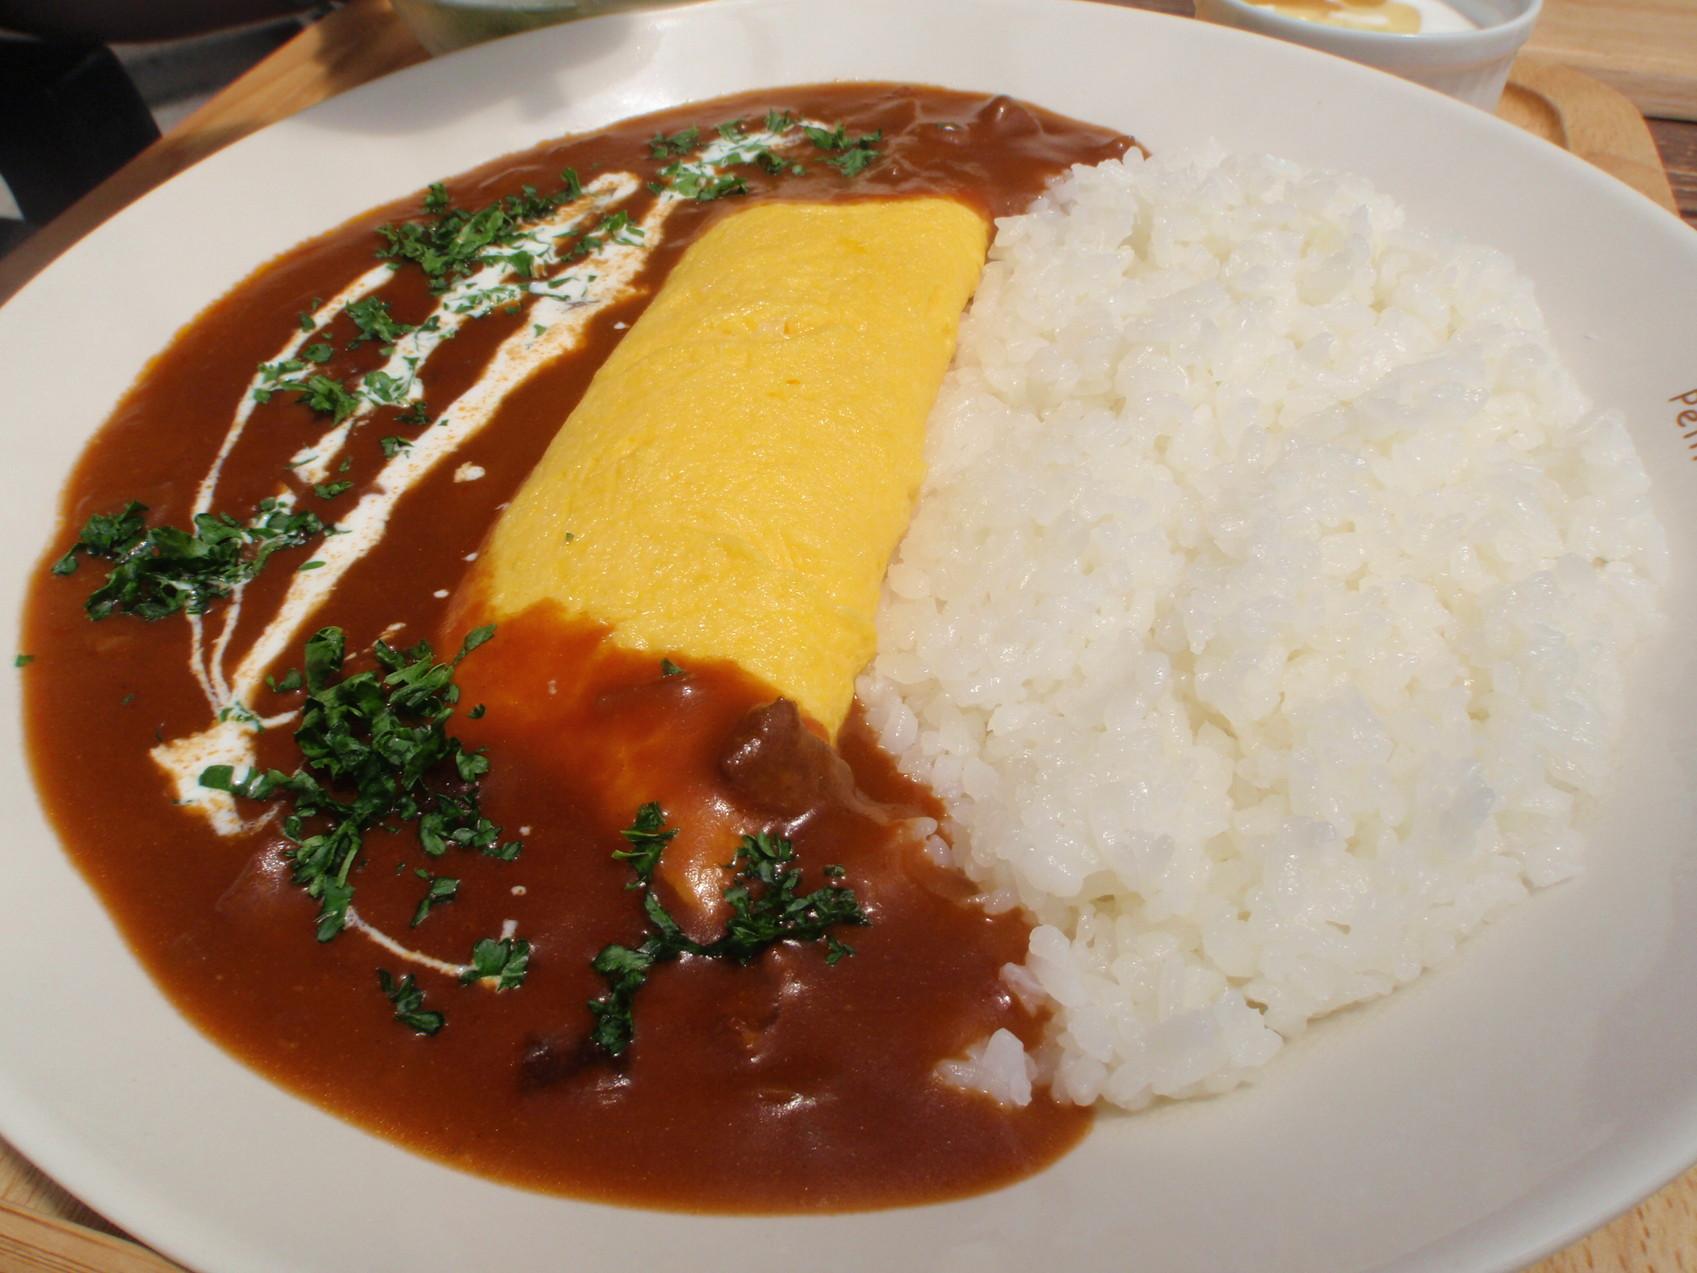 洋食屋さん HANASHINOBU